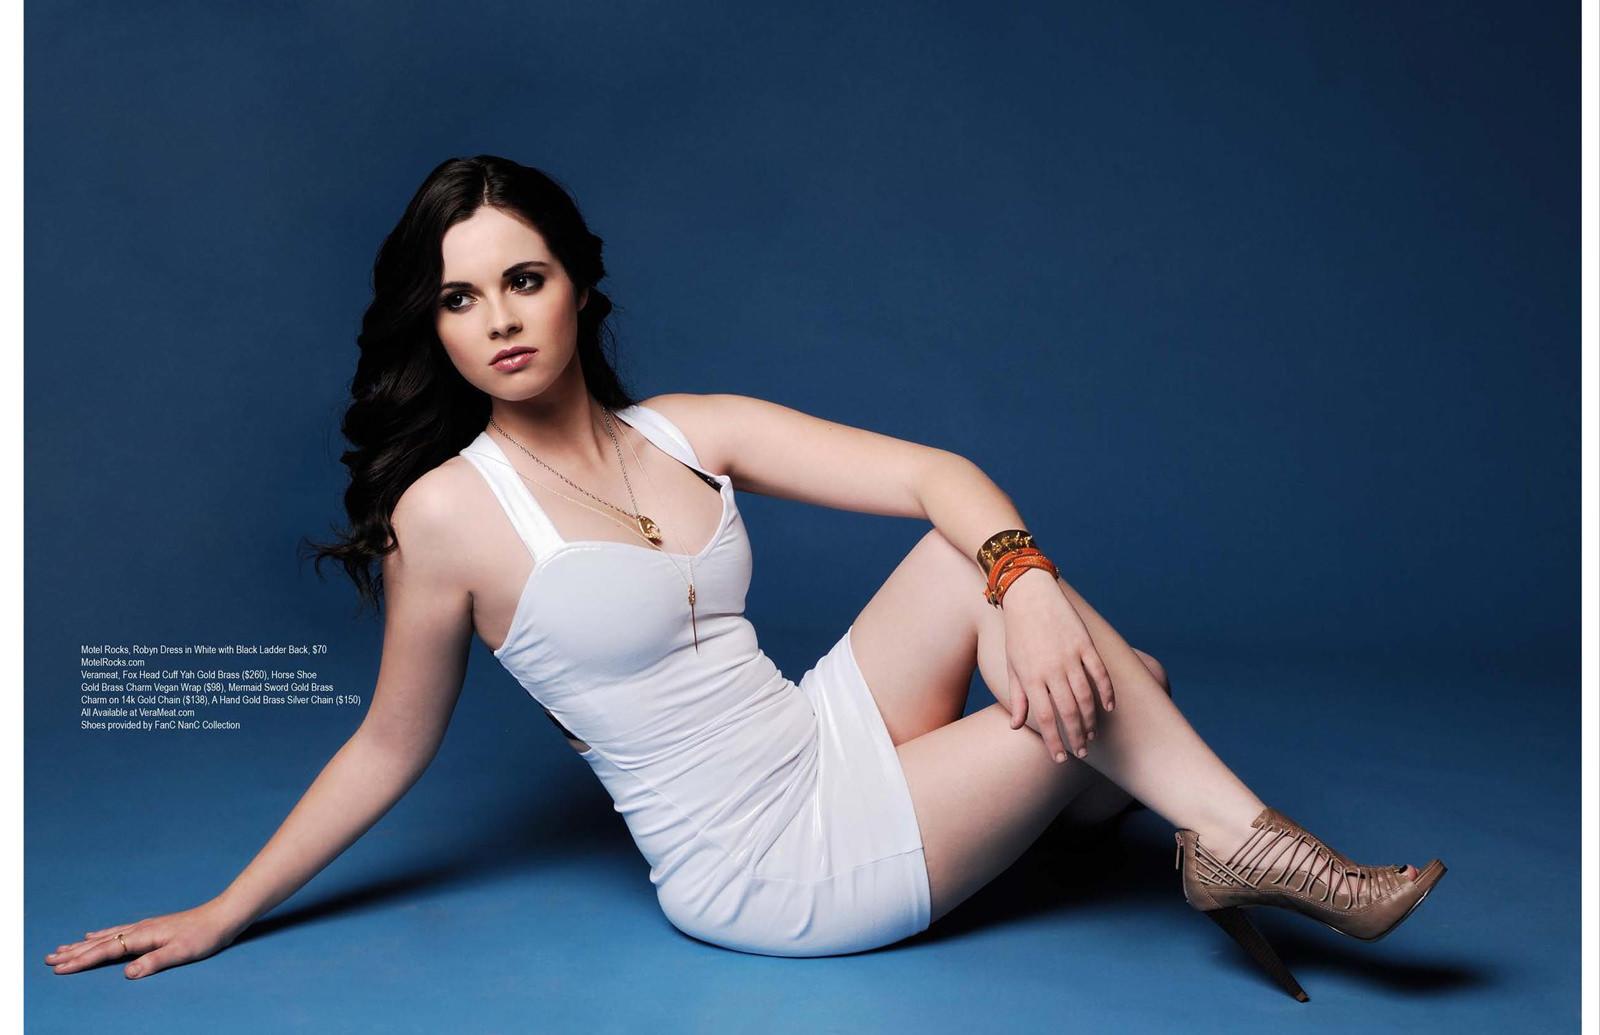 Vanessa Marano Photo Gallery